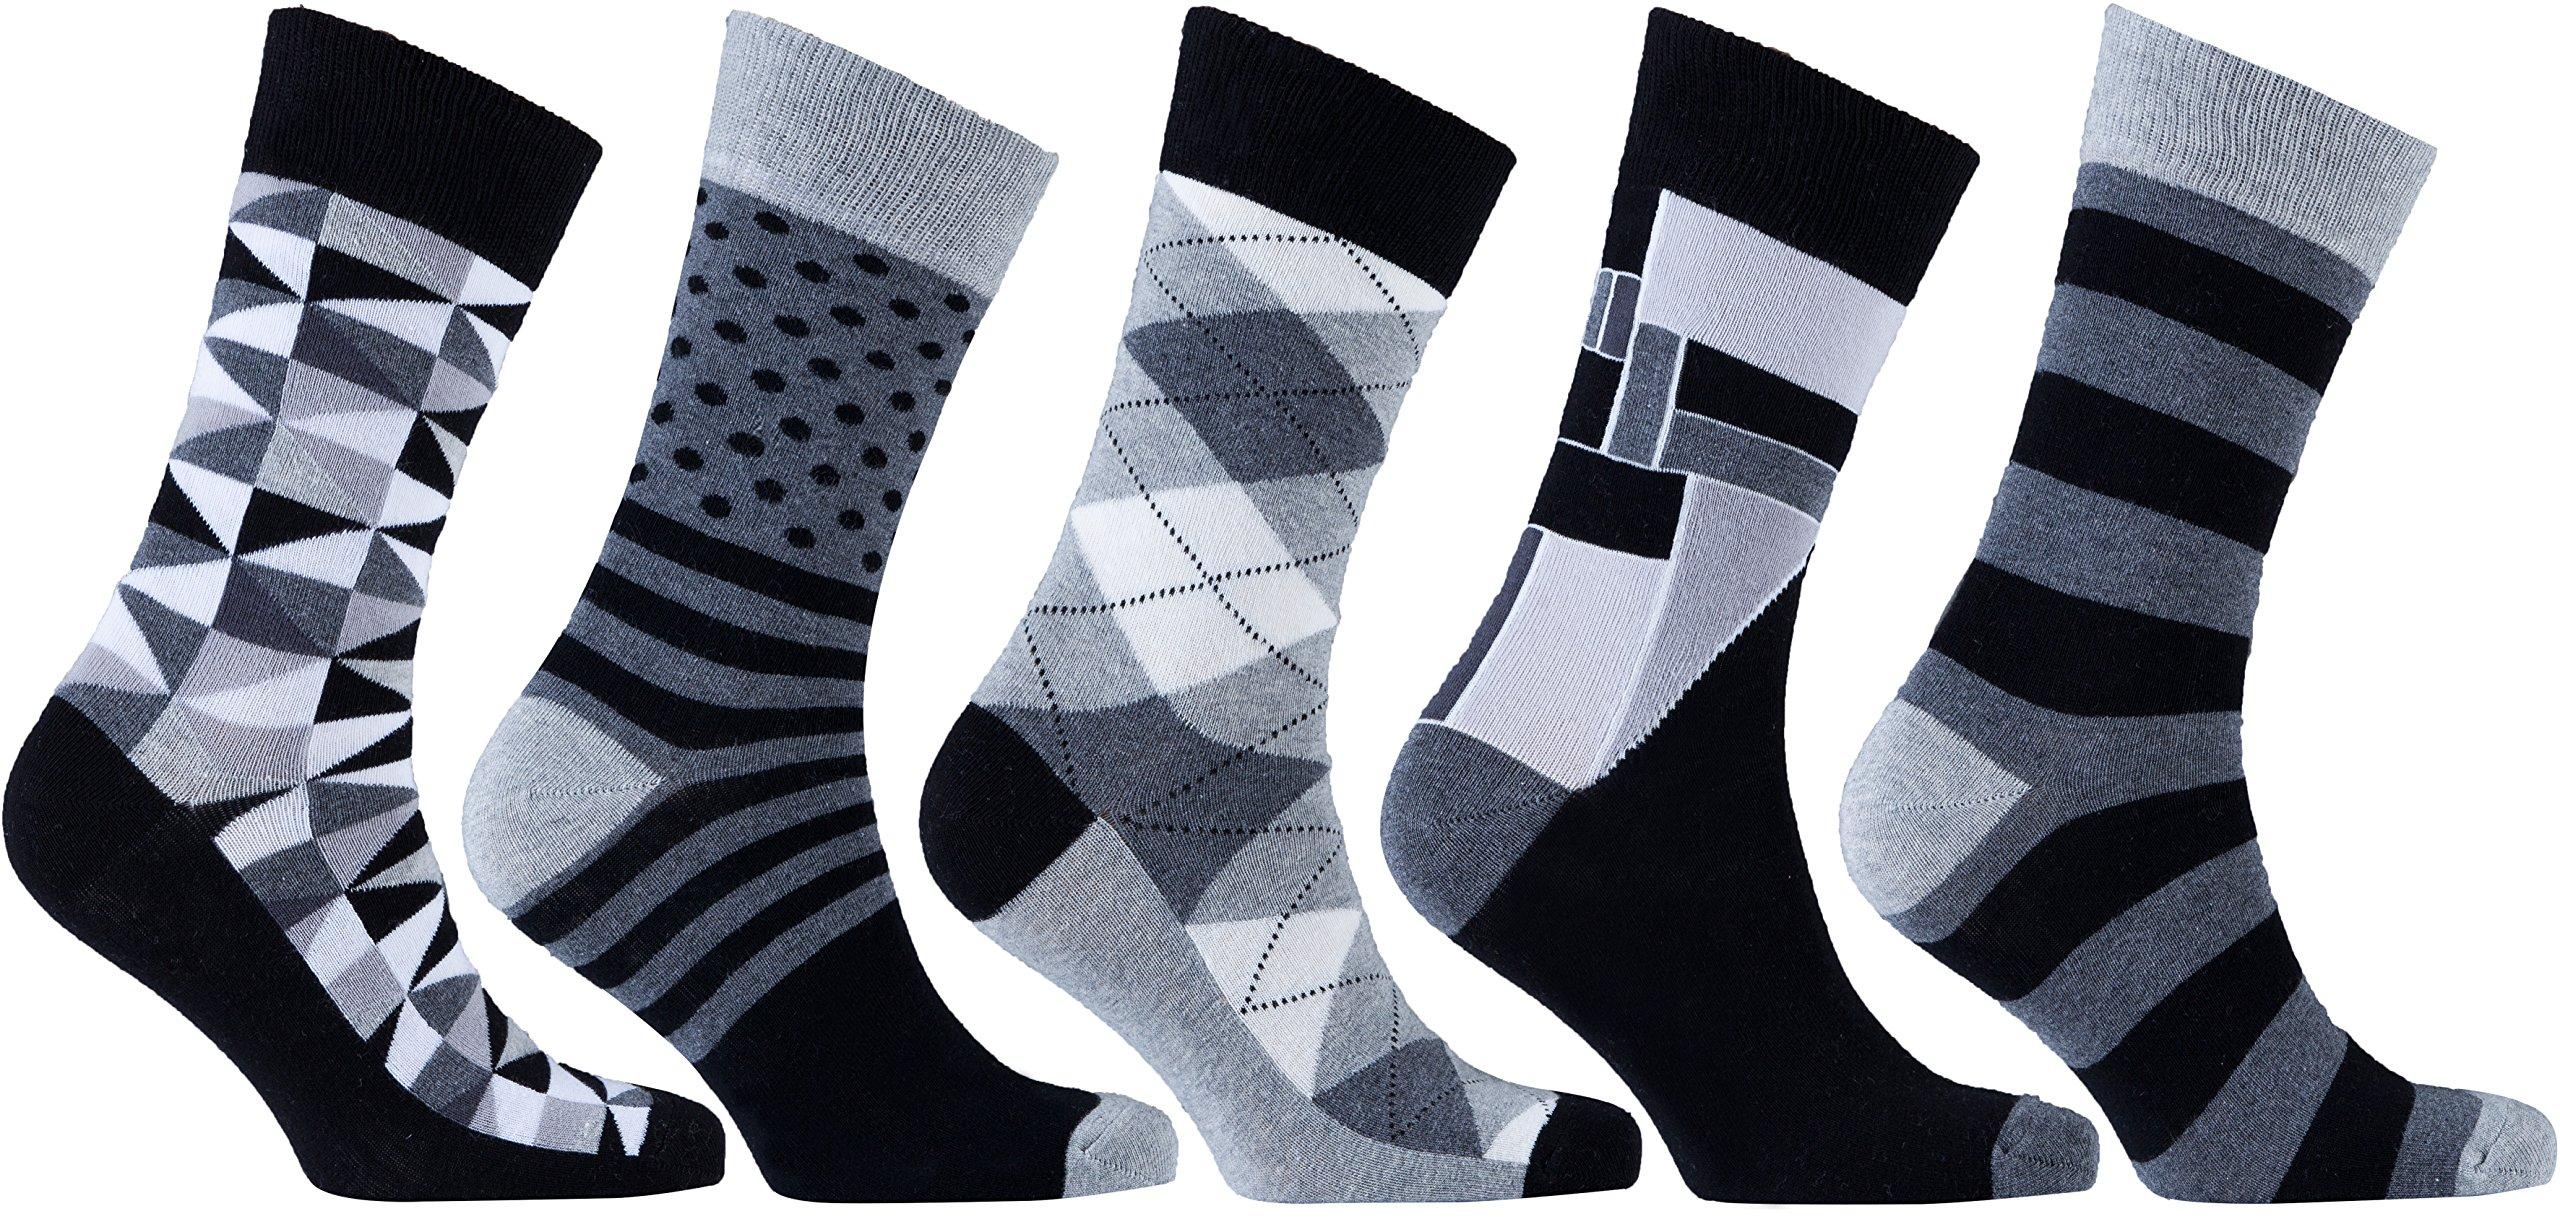 Socks n Socks-Men's 5-pair Luxury Fun Cool Cotton Colorful Mix Socks Gift Box